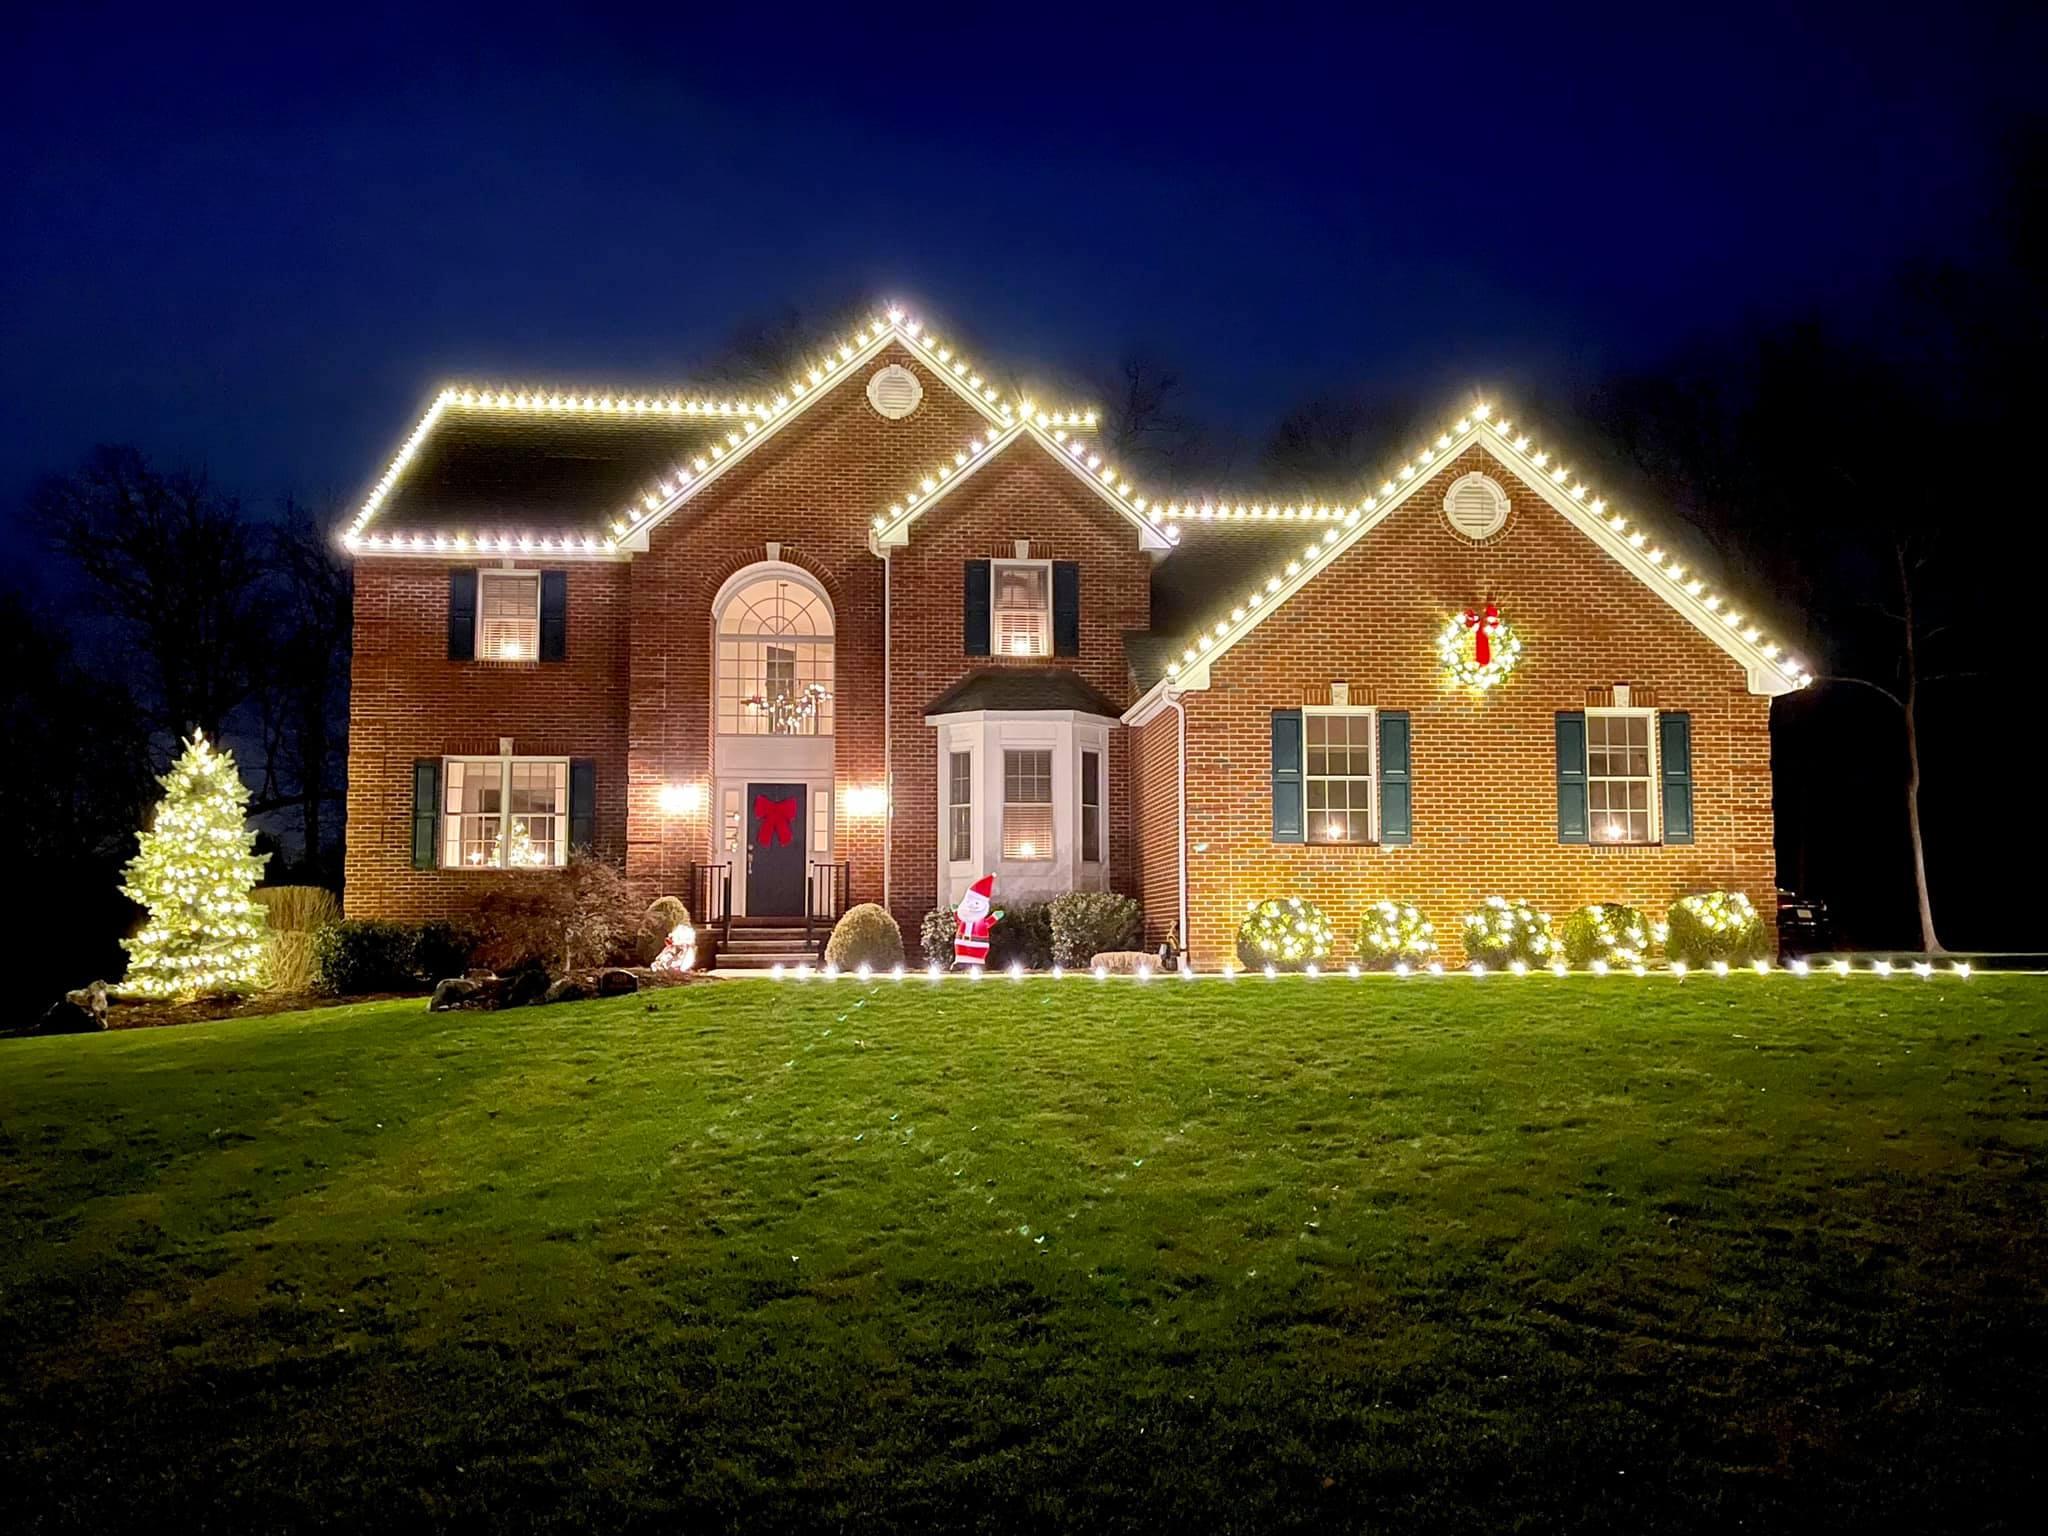 Holiday-Lights-Image